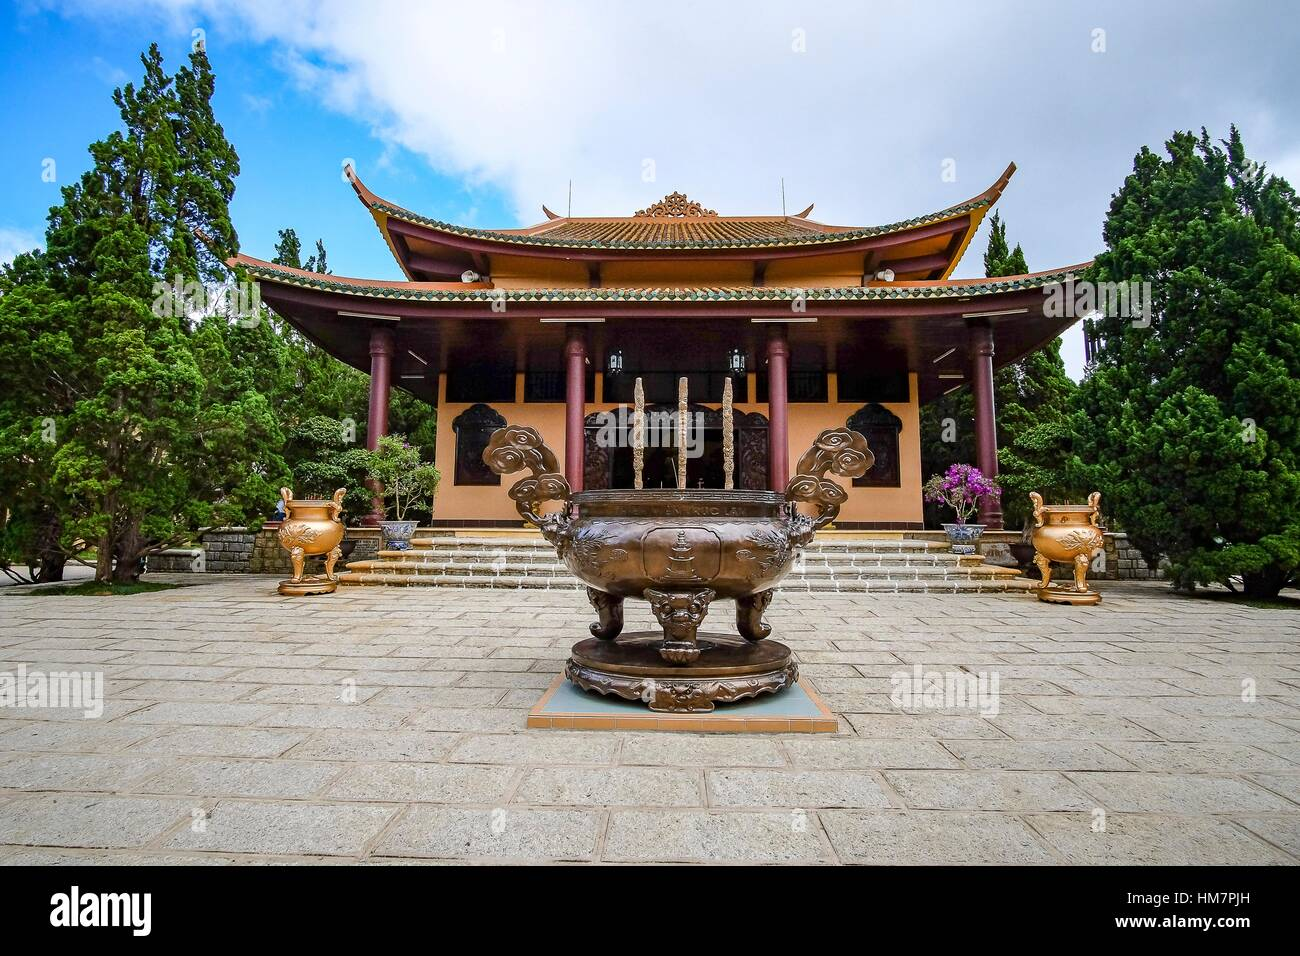 Thien Vien Truc Lam Monastery, Dalat, Vietnam - Stock Image